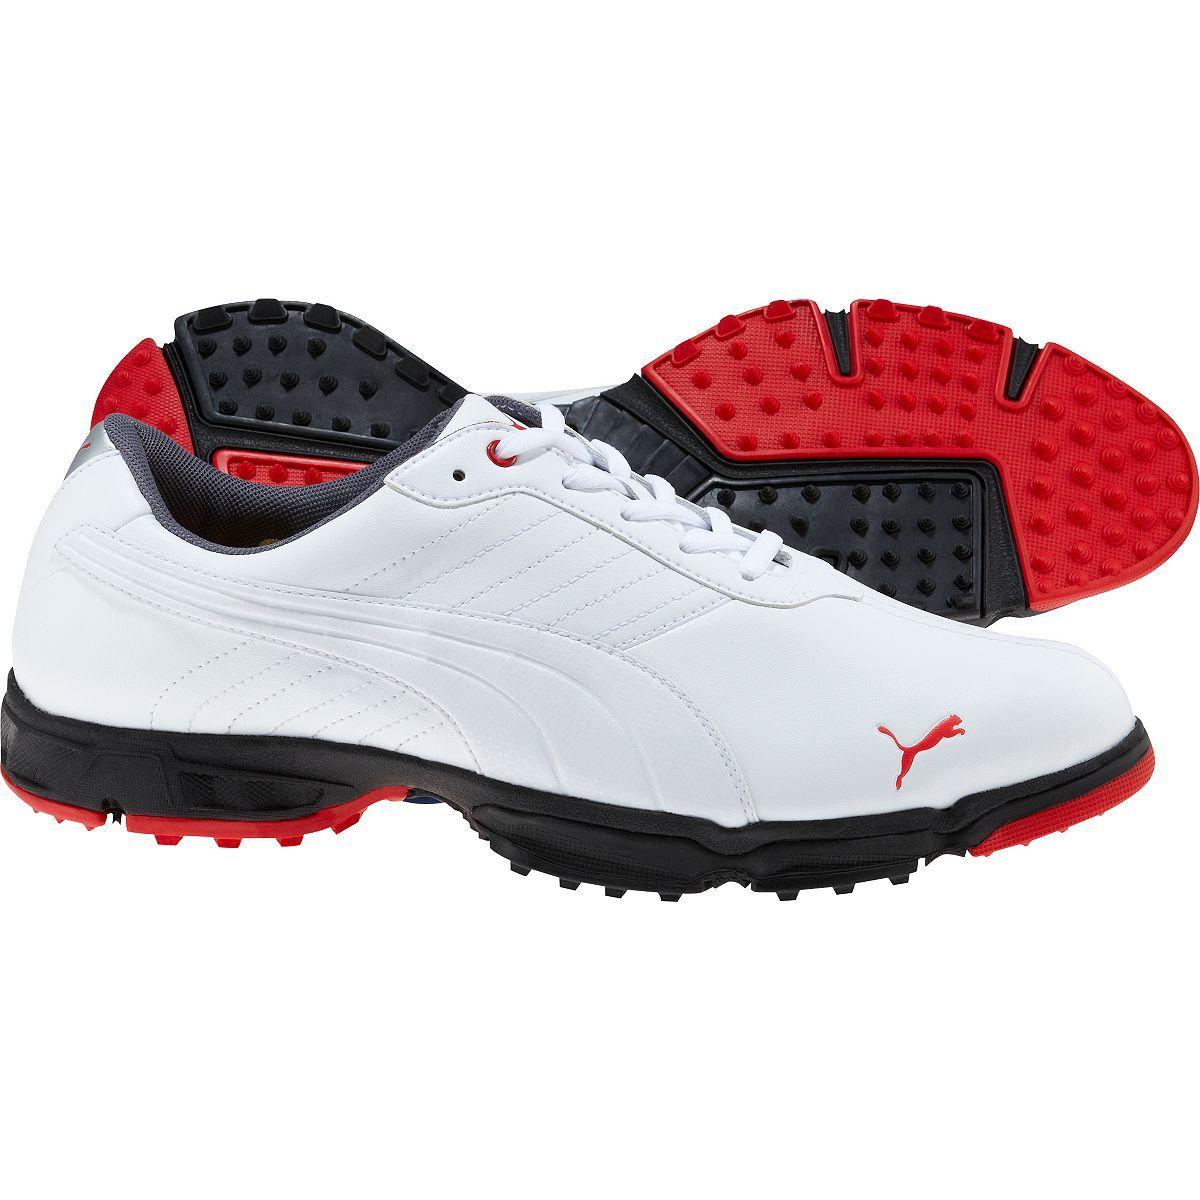 Puma Men's AMP Scramble Golf Shoes White Puma mens